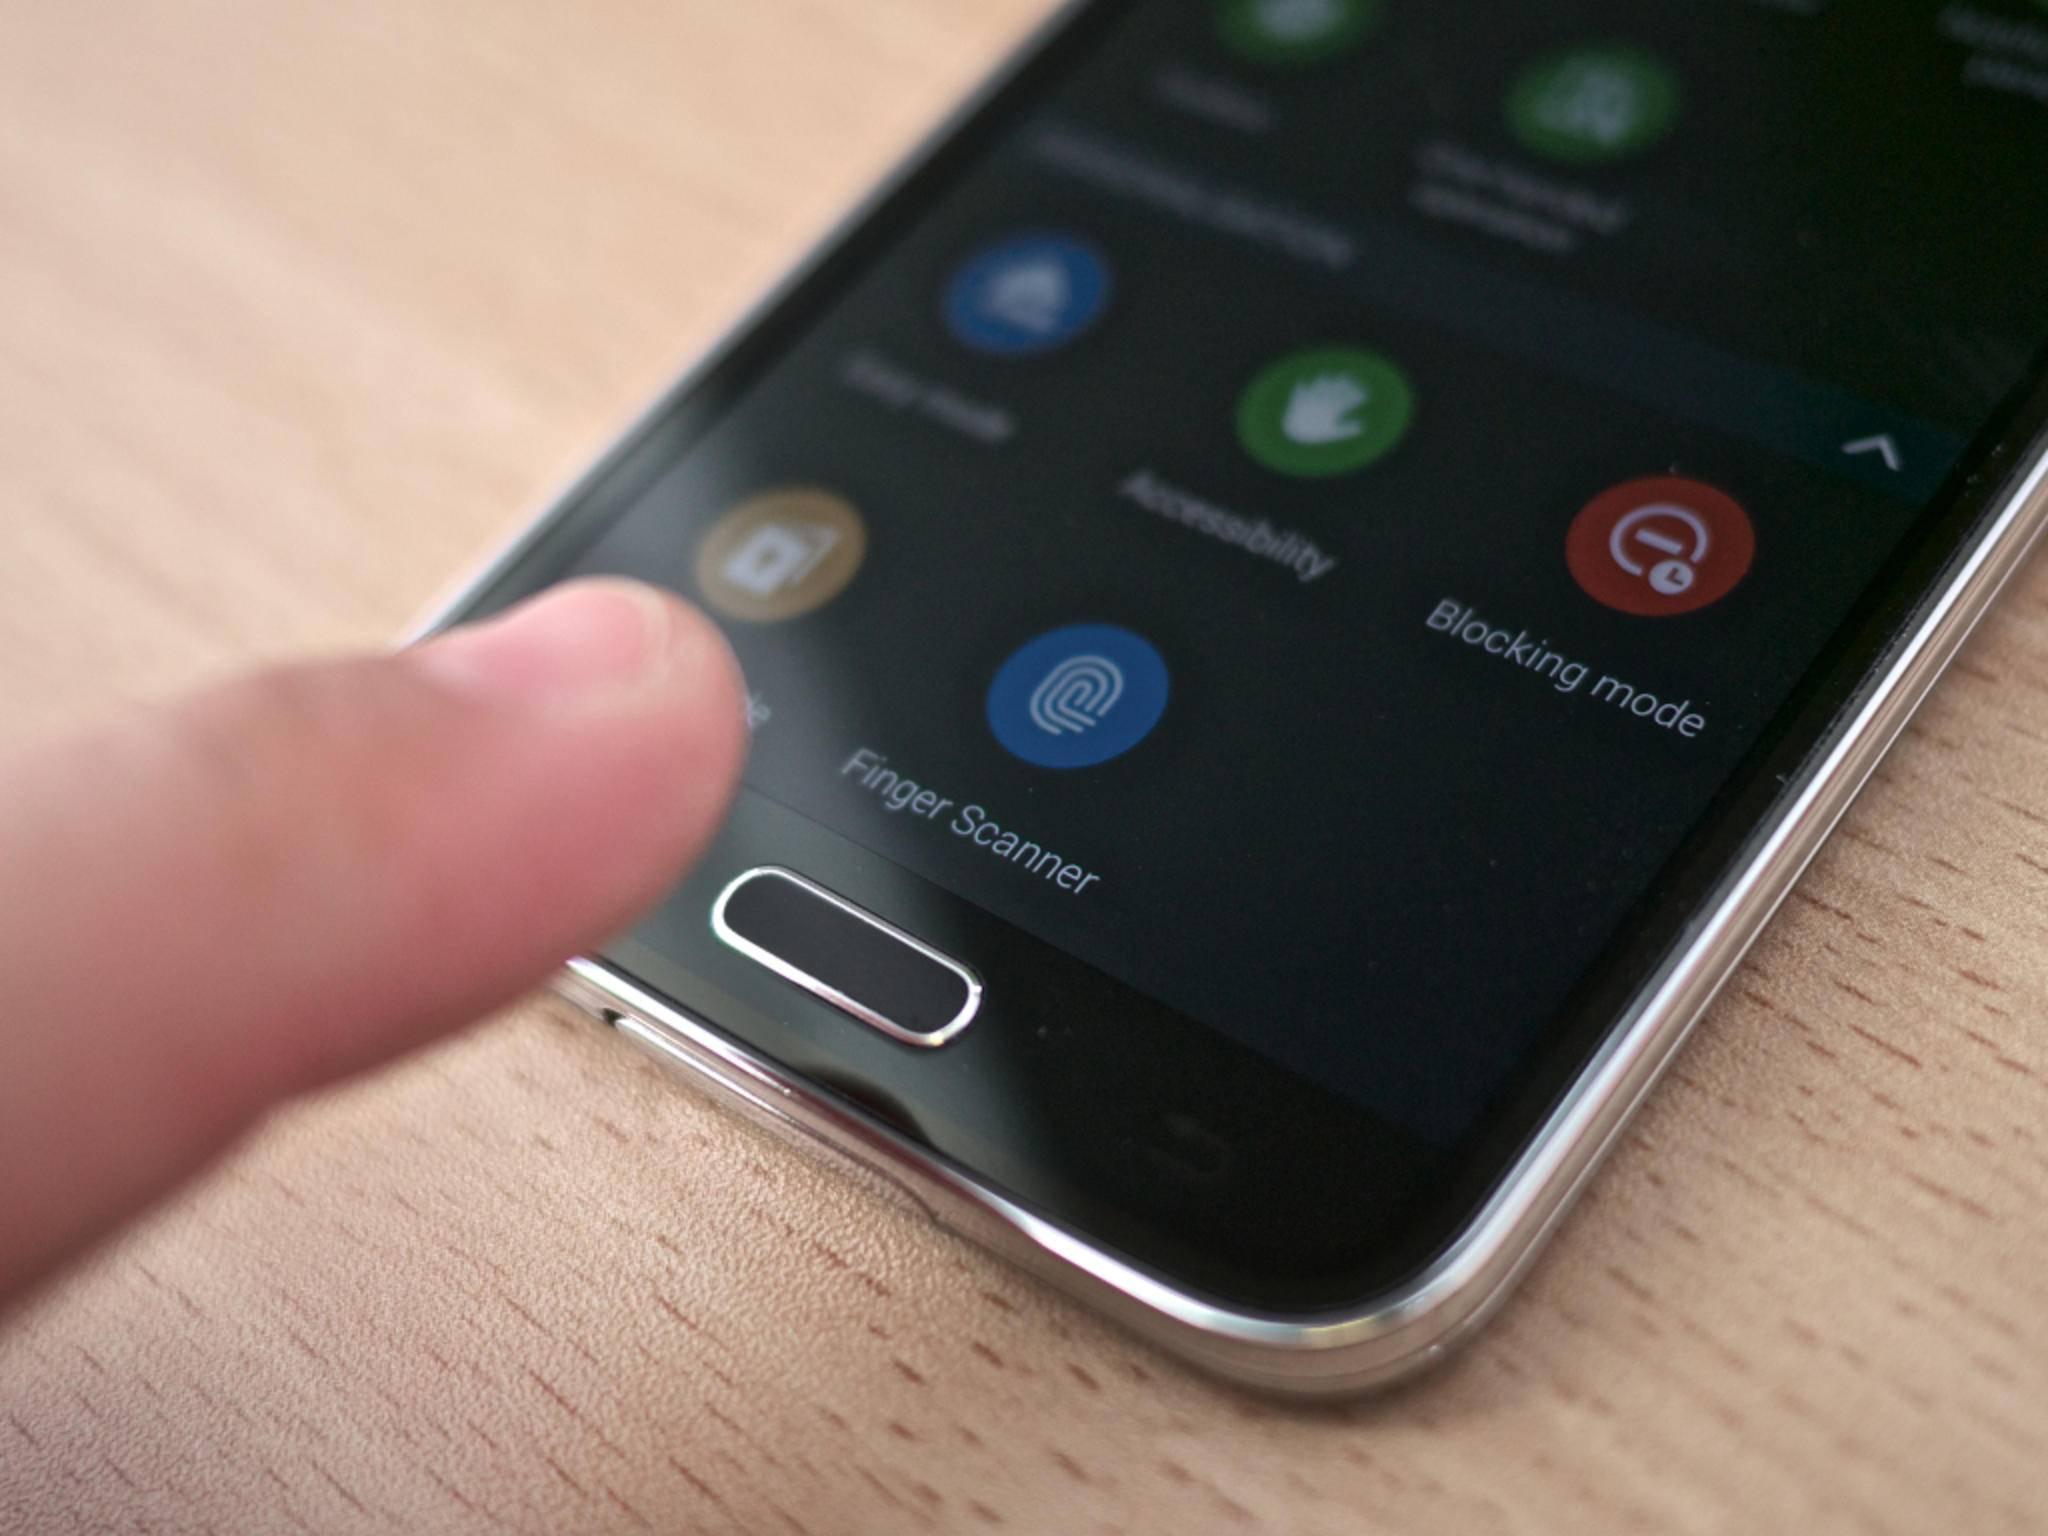 Samsung-Smartphones sollen dank BlackBerry in Zukunft noch sicherer werden.